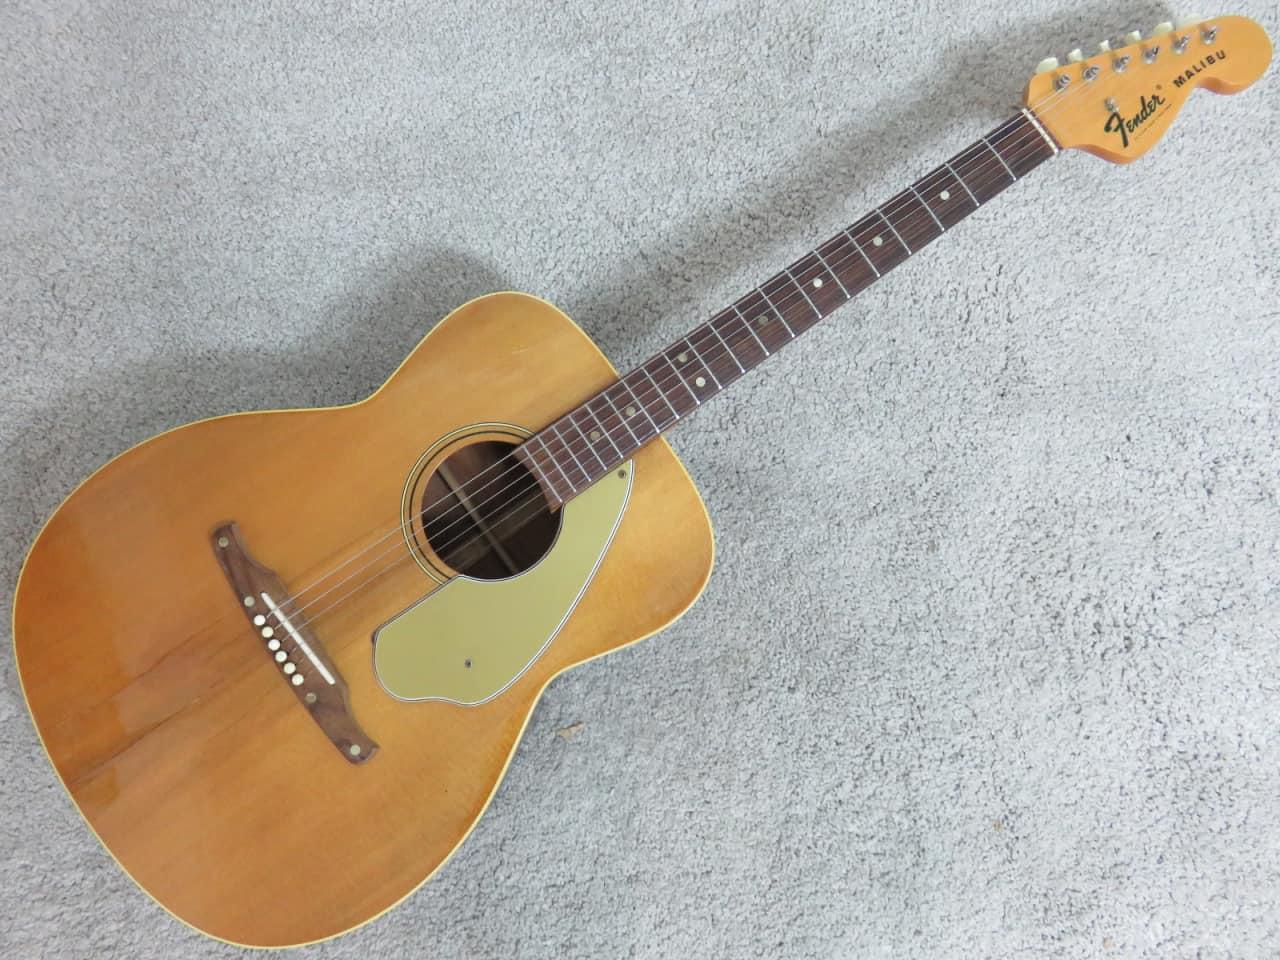 Vintage 1965 Fender Malibu Acoustic Guitar Secret Weapon